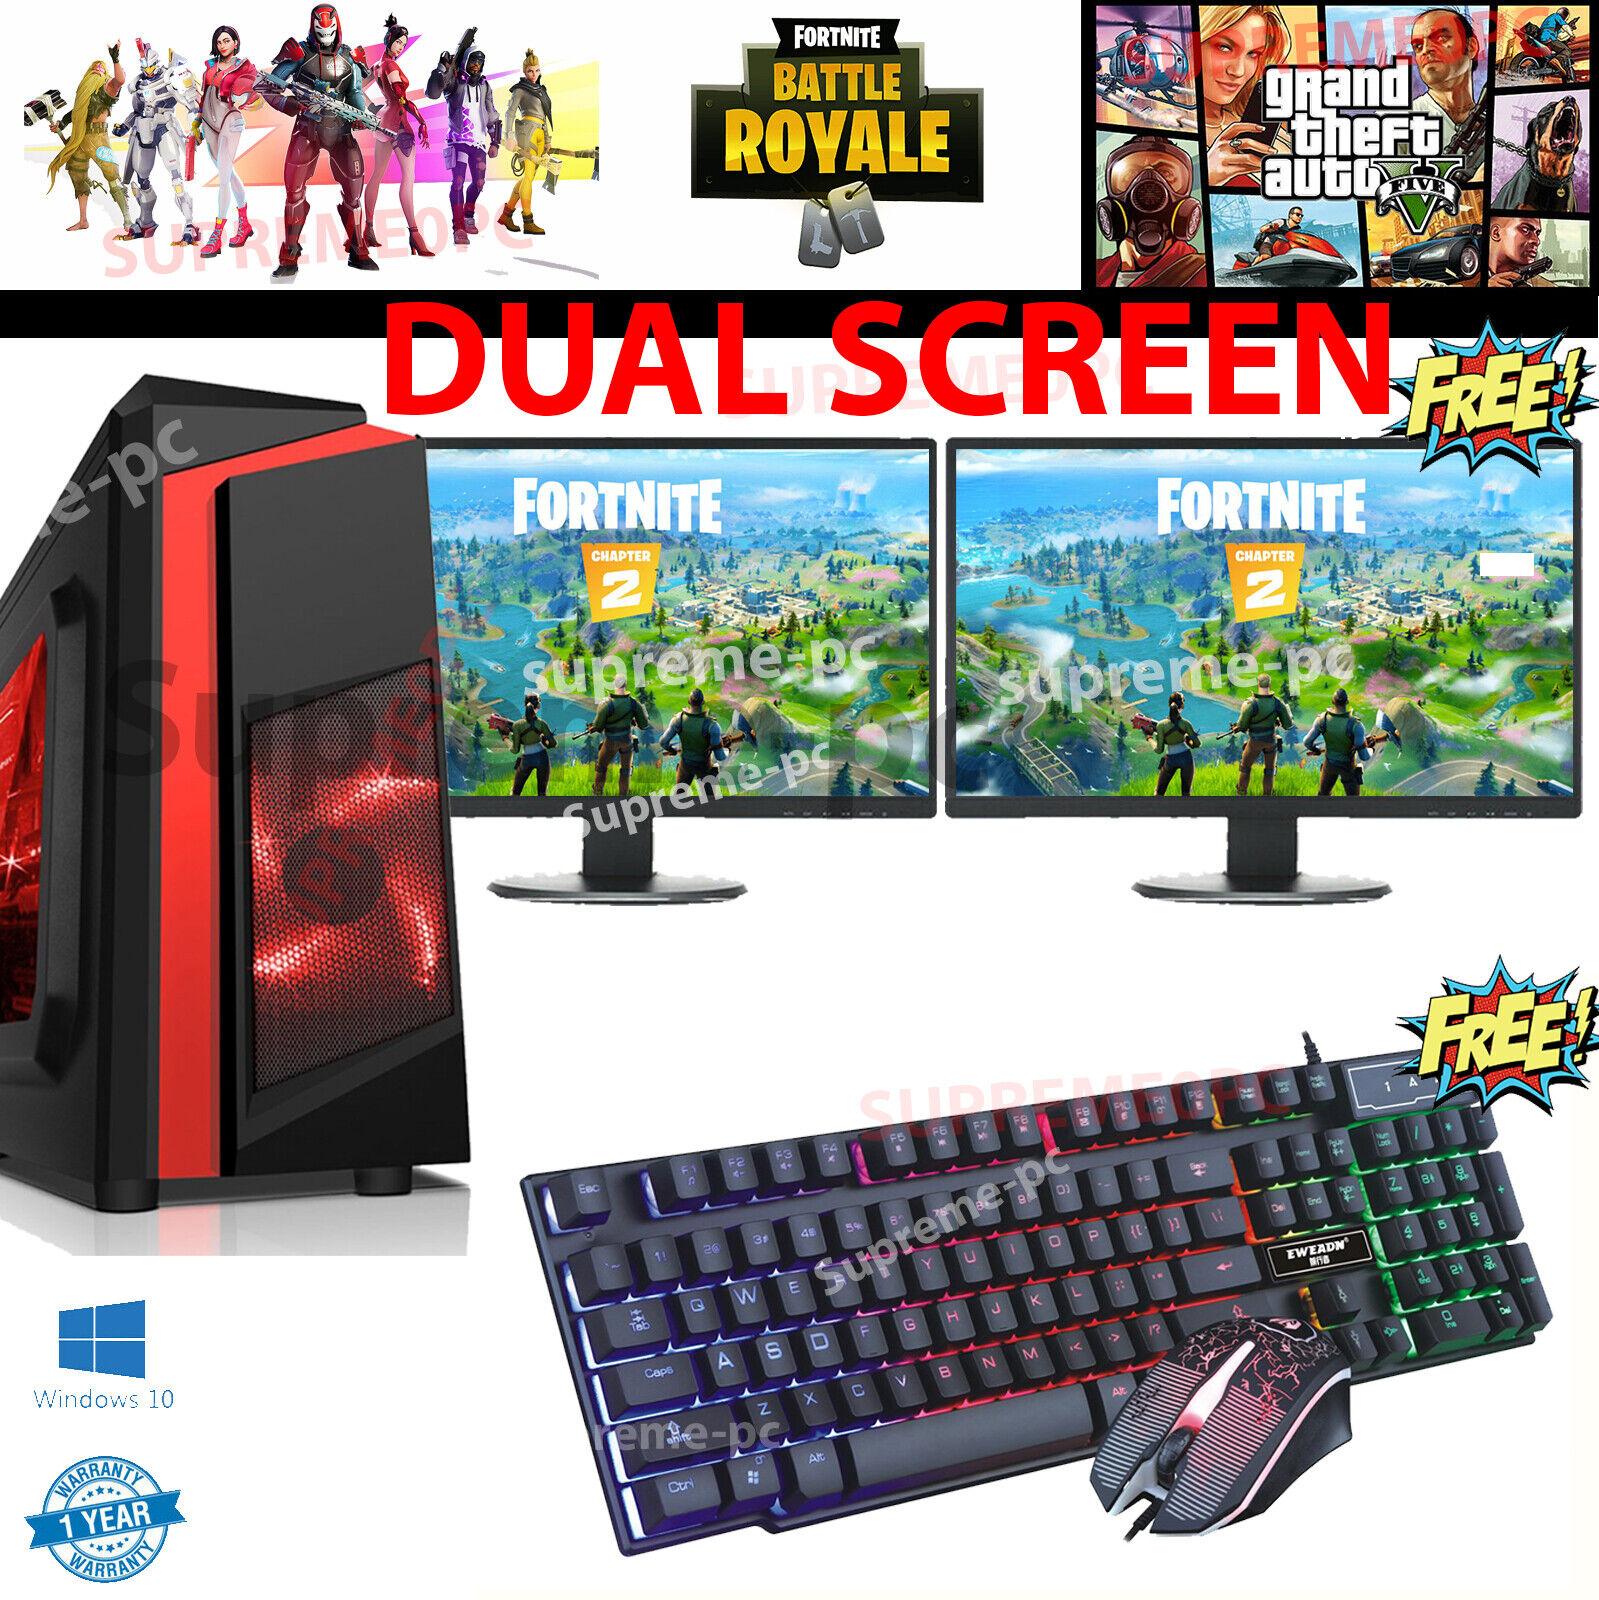 Computer Games - Fast Gaming PC Computer DUAL SCREEN intel Core i5 16GB 1TB Windows 10 2GB GT710